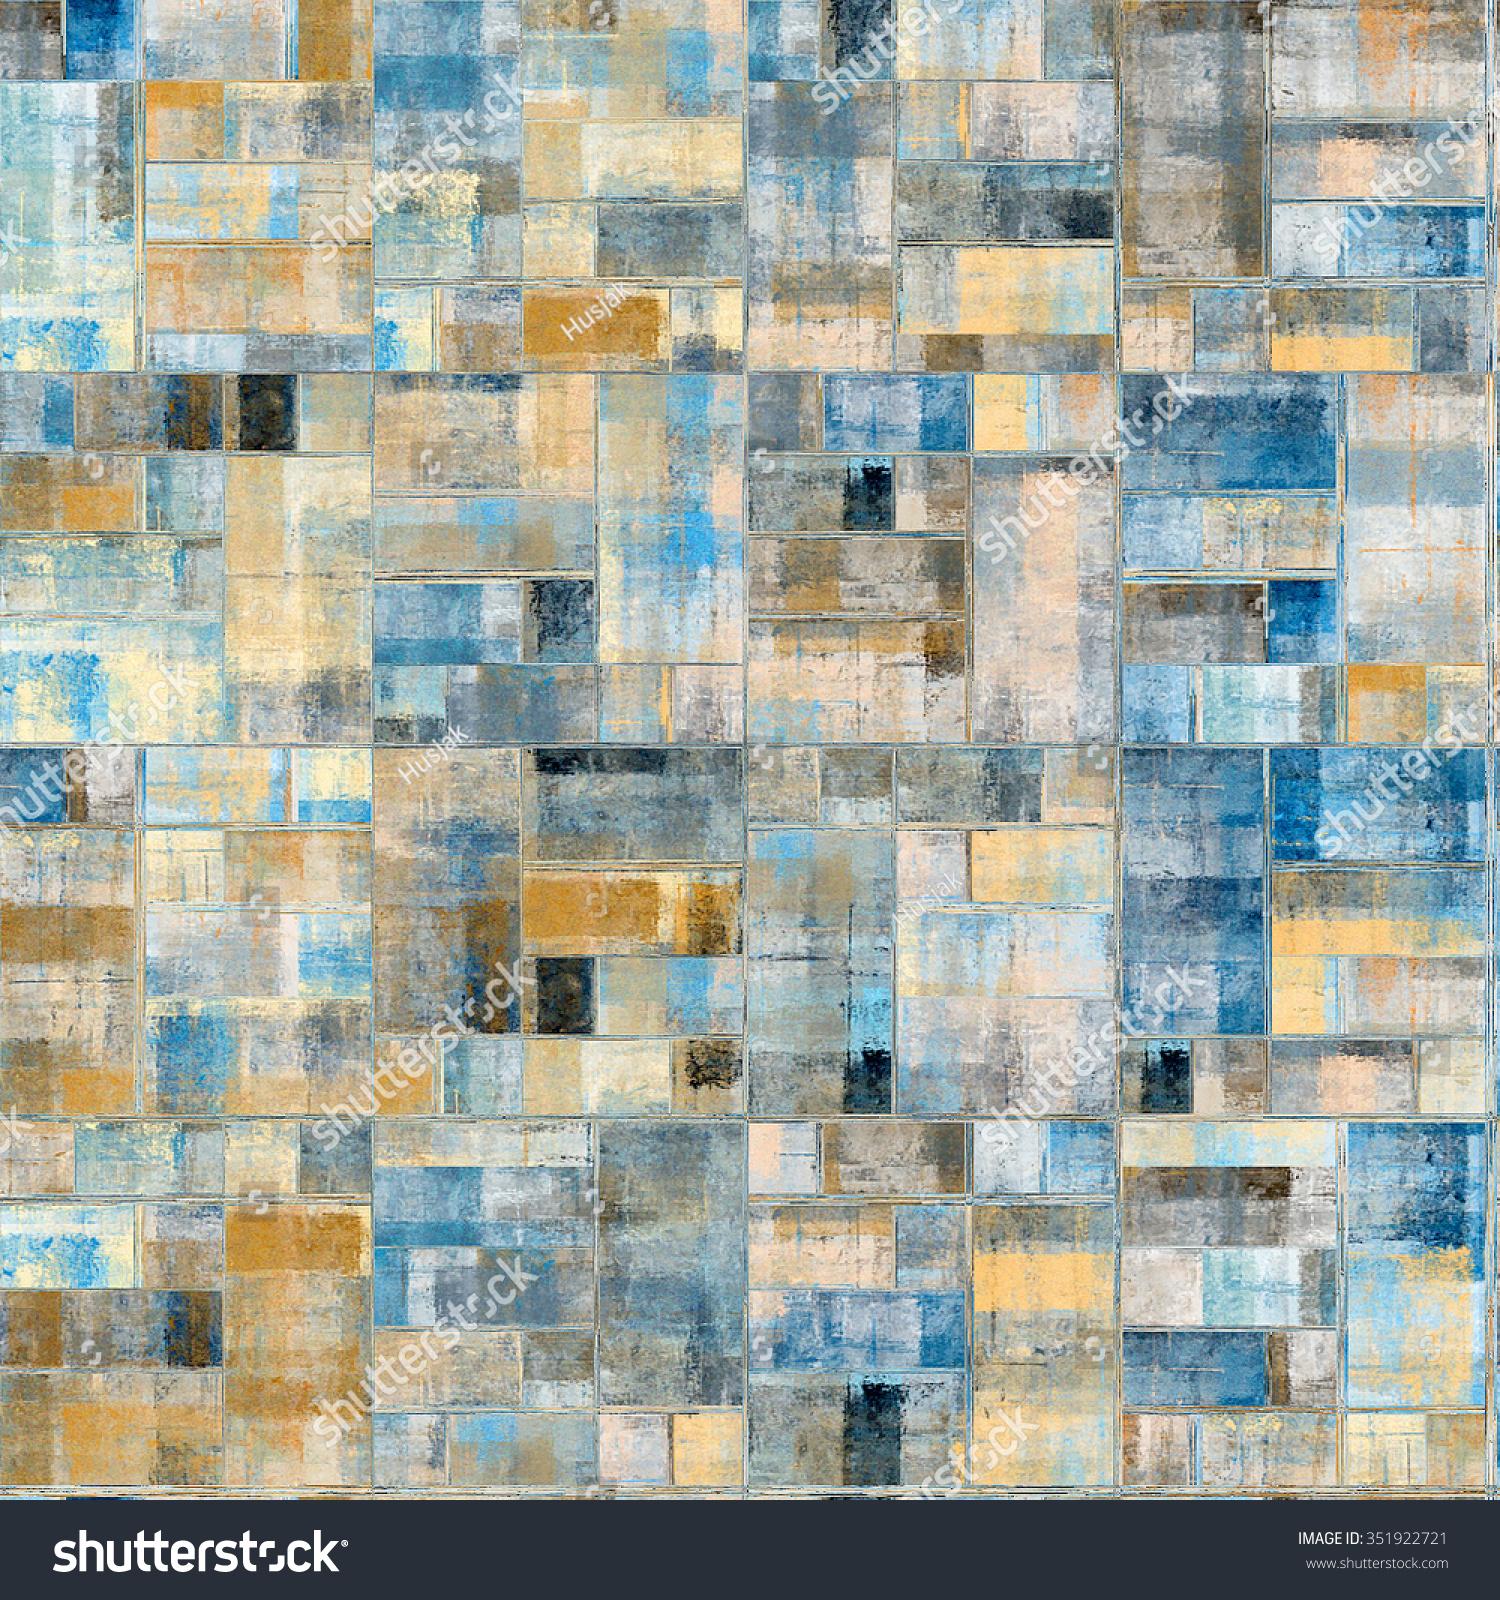 Abstract Painting Wall Tiles Mosaic Ceramic Stock Illustration ...